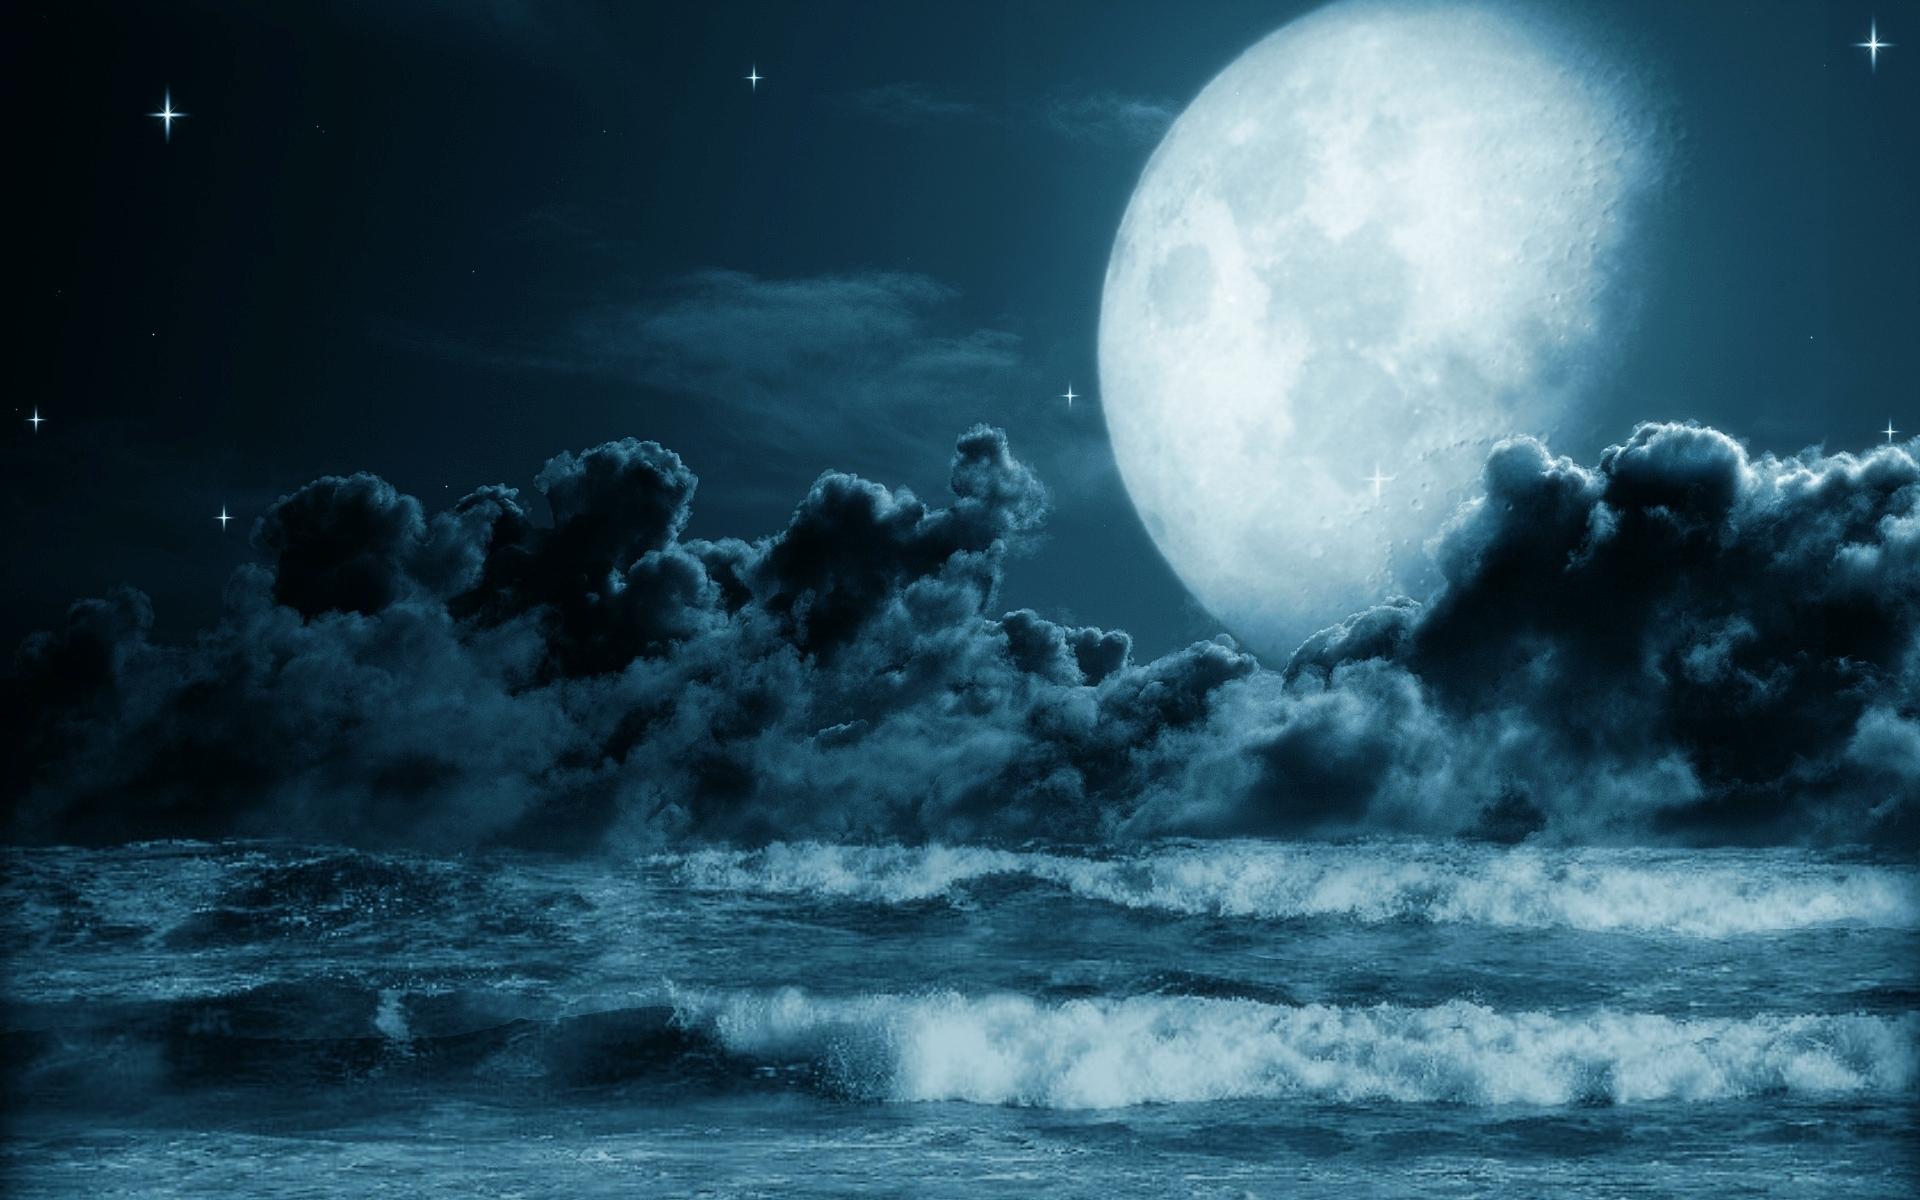 full moon hd desktop computer #wallpaper - hd wallpapers